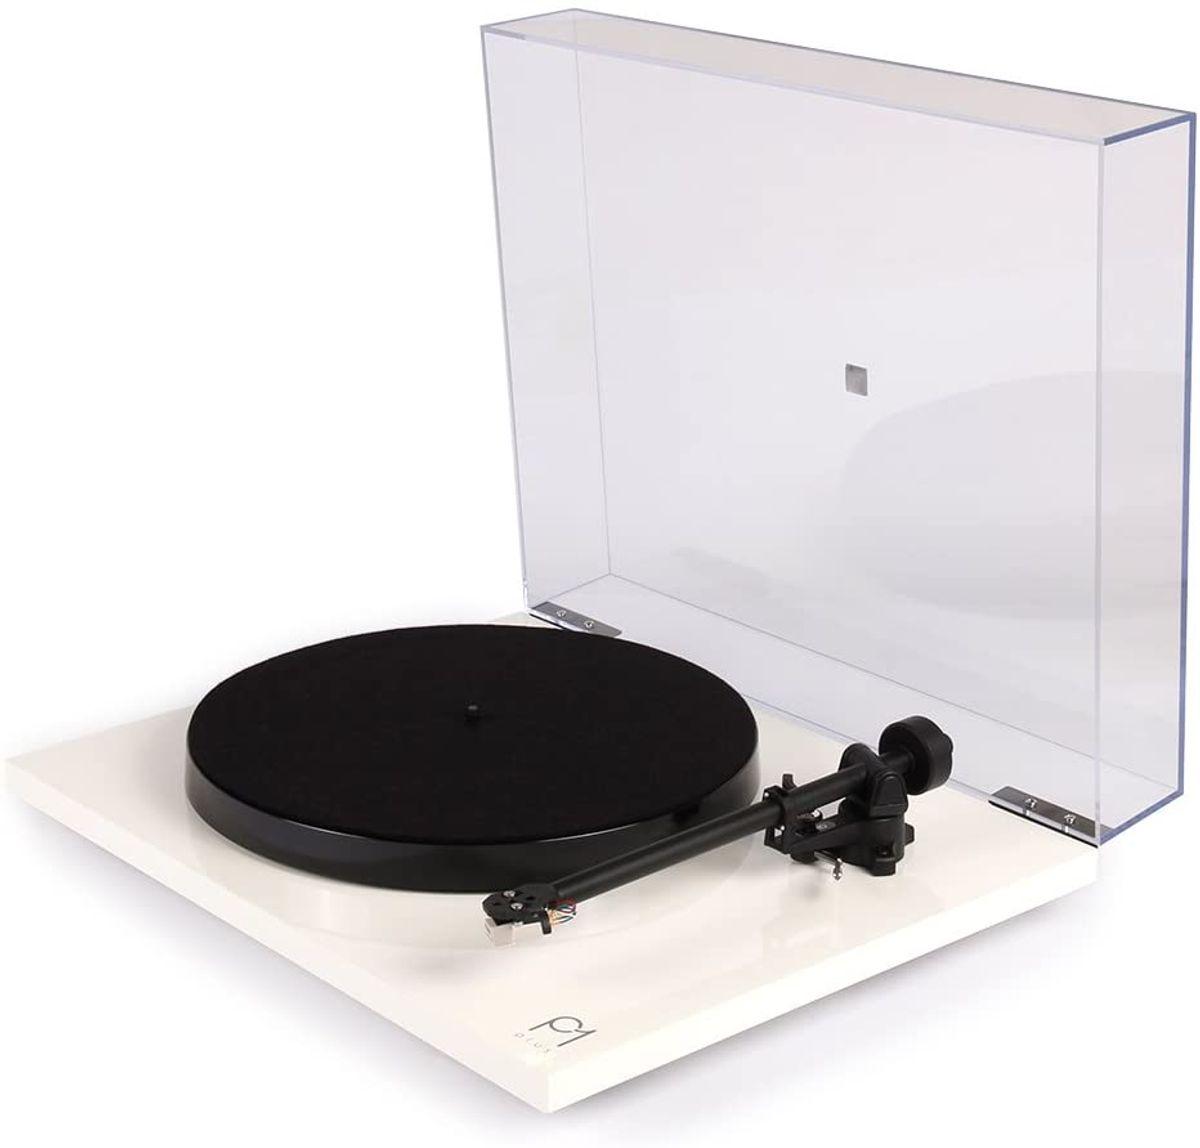 Plattenspieler Rega Planar 1 plus (mit integriertem Phono-Vorverstärker)